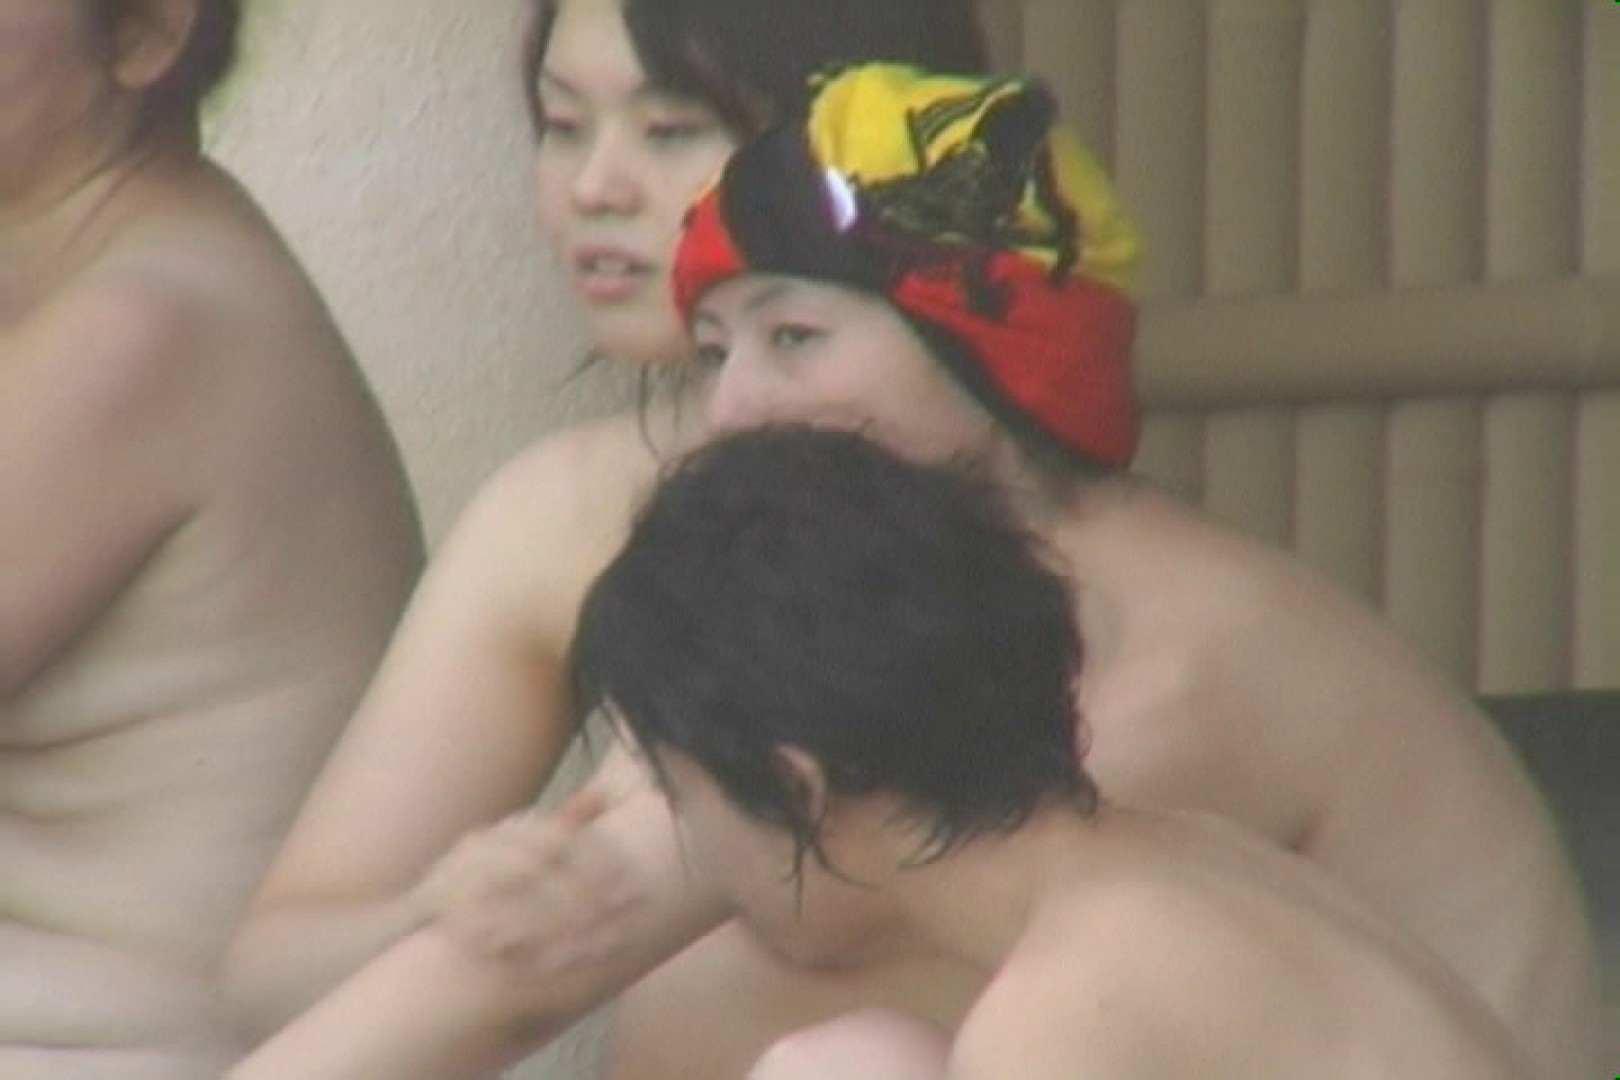 Aquaな露天風呂Vol.61【VIP限定】 露天風呂編  113PIX 30